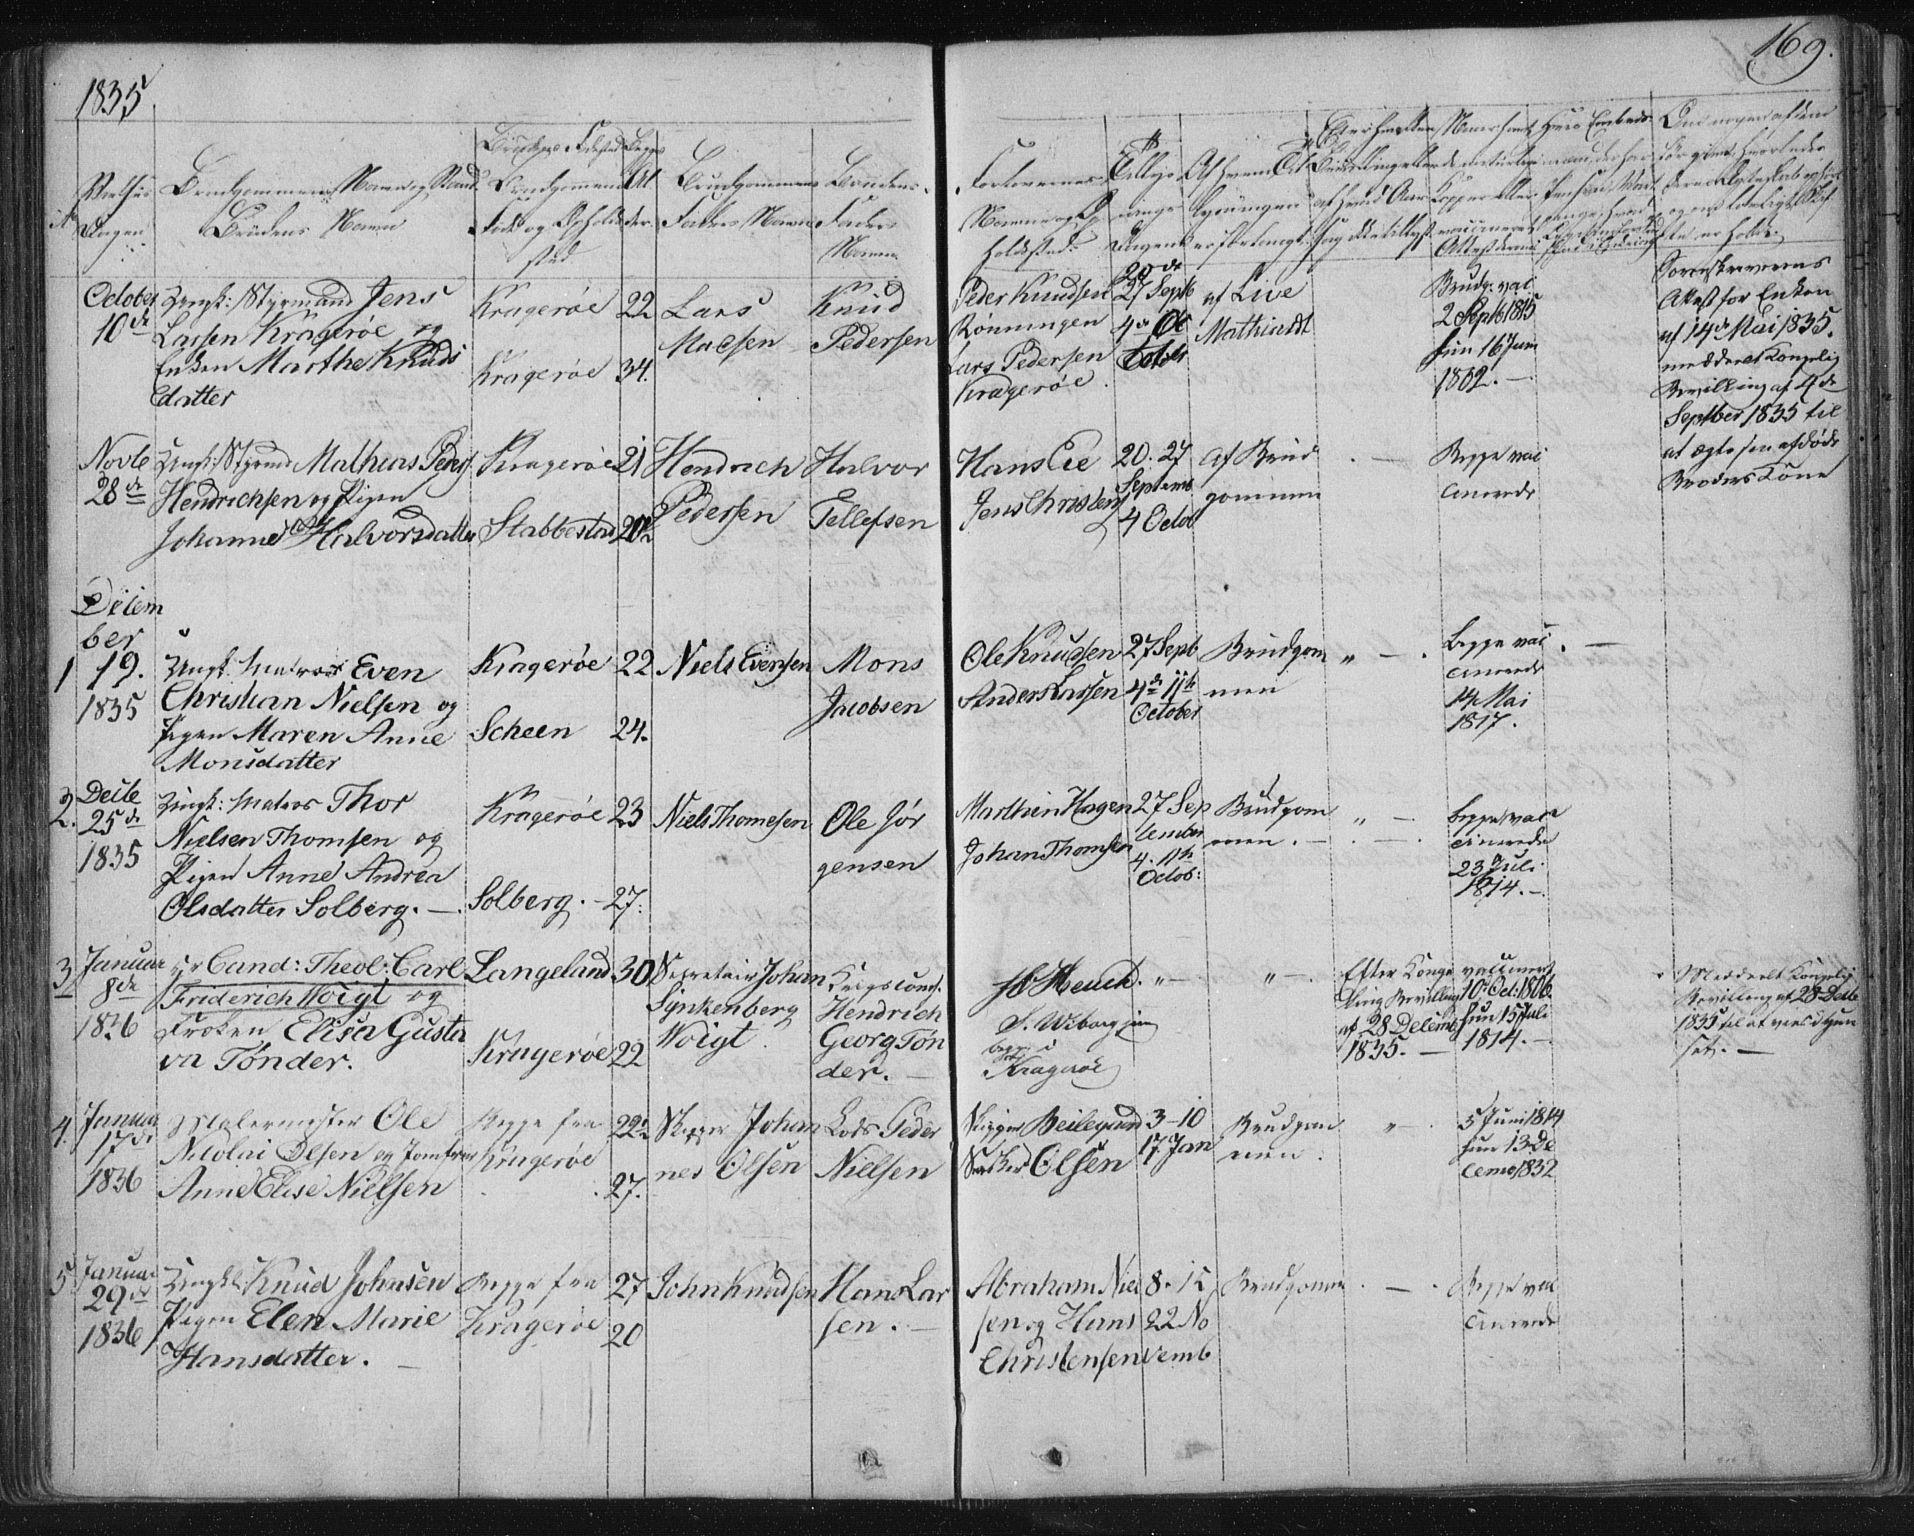 SAKO, Kragerø kirkebøker, F/Fa/L0005: Ministerialbok nr. 5, 1832-1847, s. 169